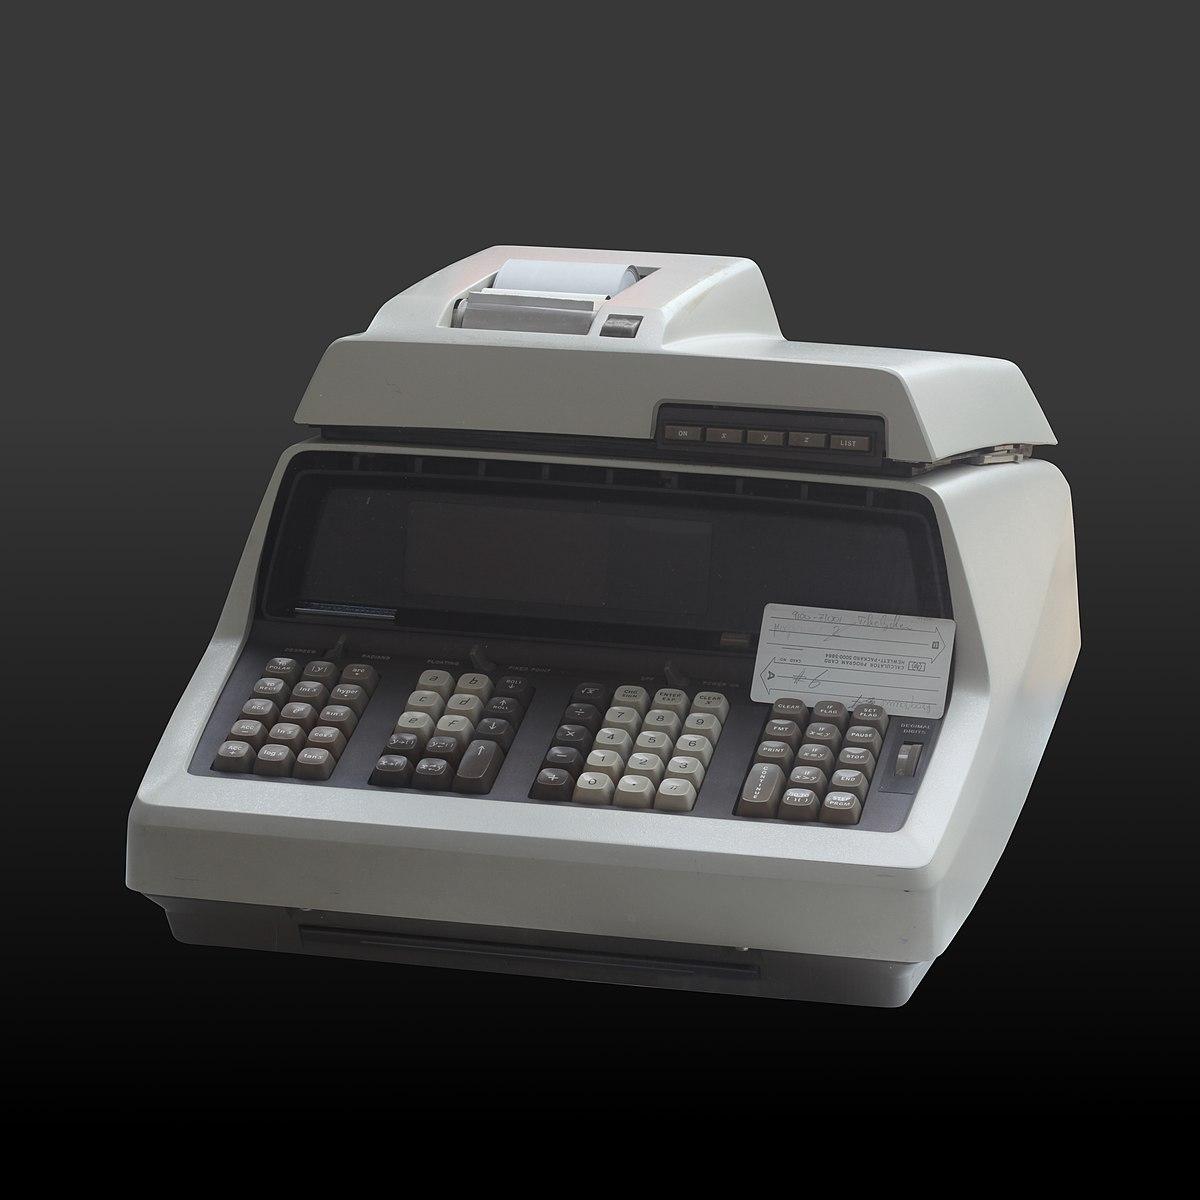 Hewlett-Packard 9100A - Wikipedia